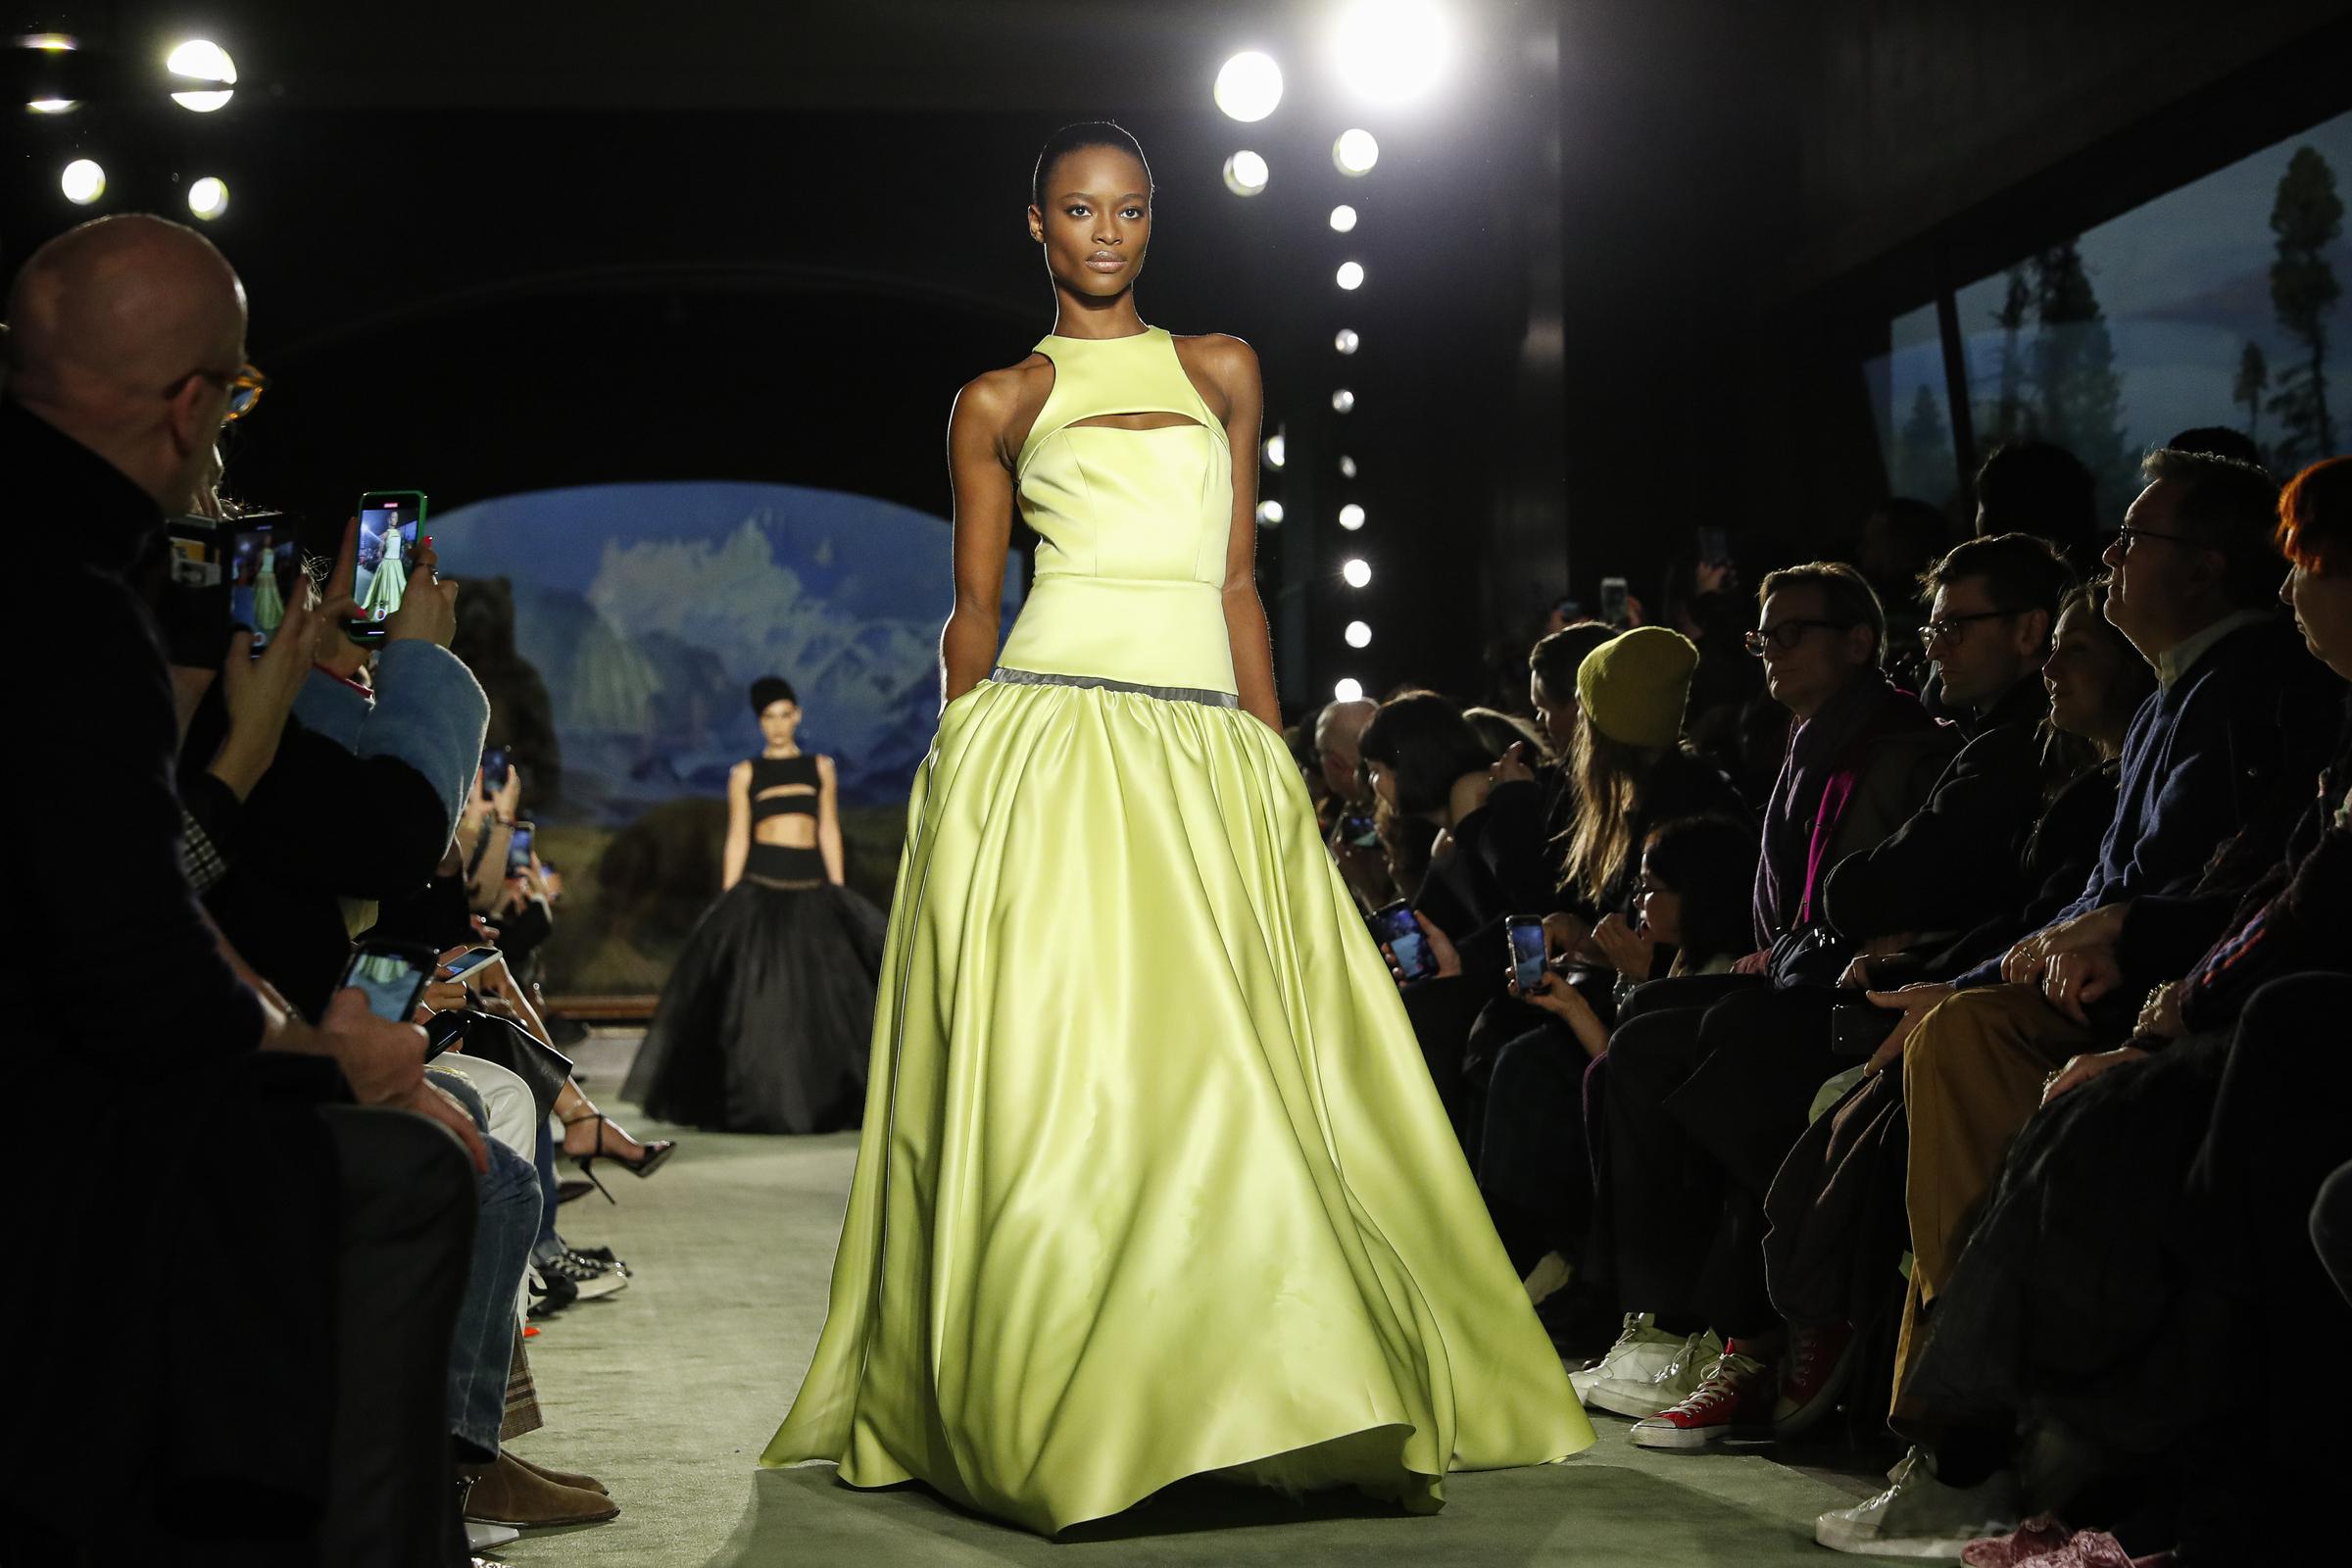 New York, Fashion Week (AP Photo/John Minchillo)